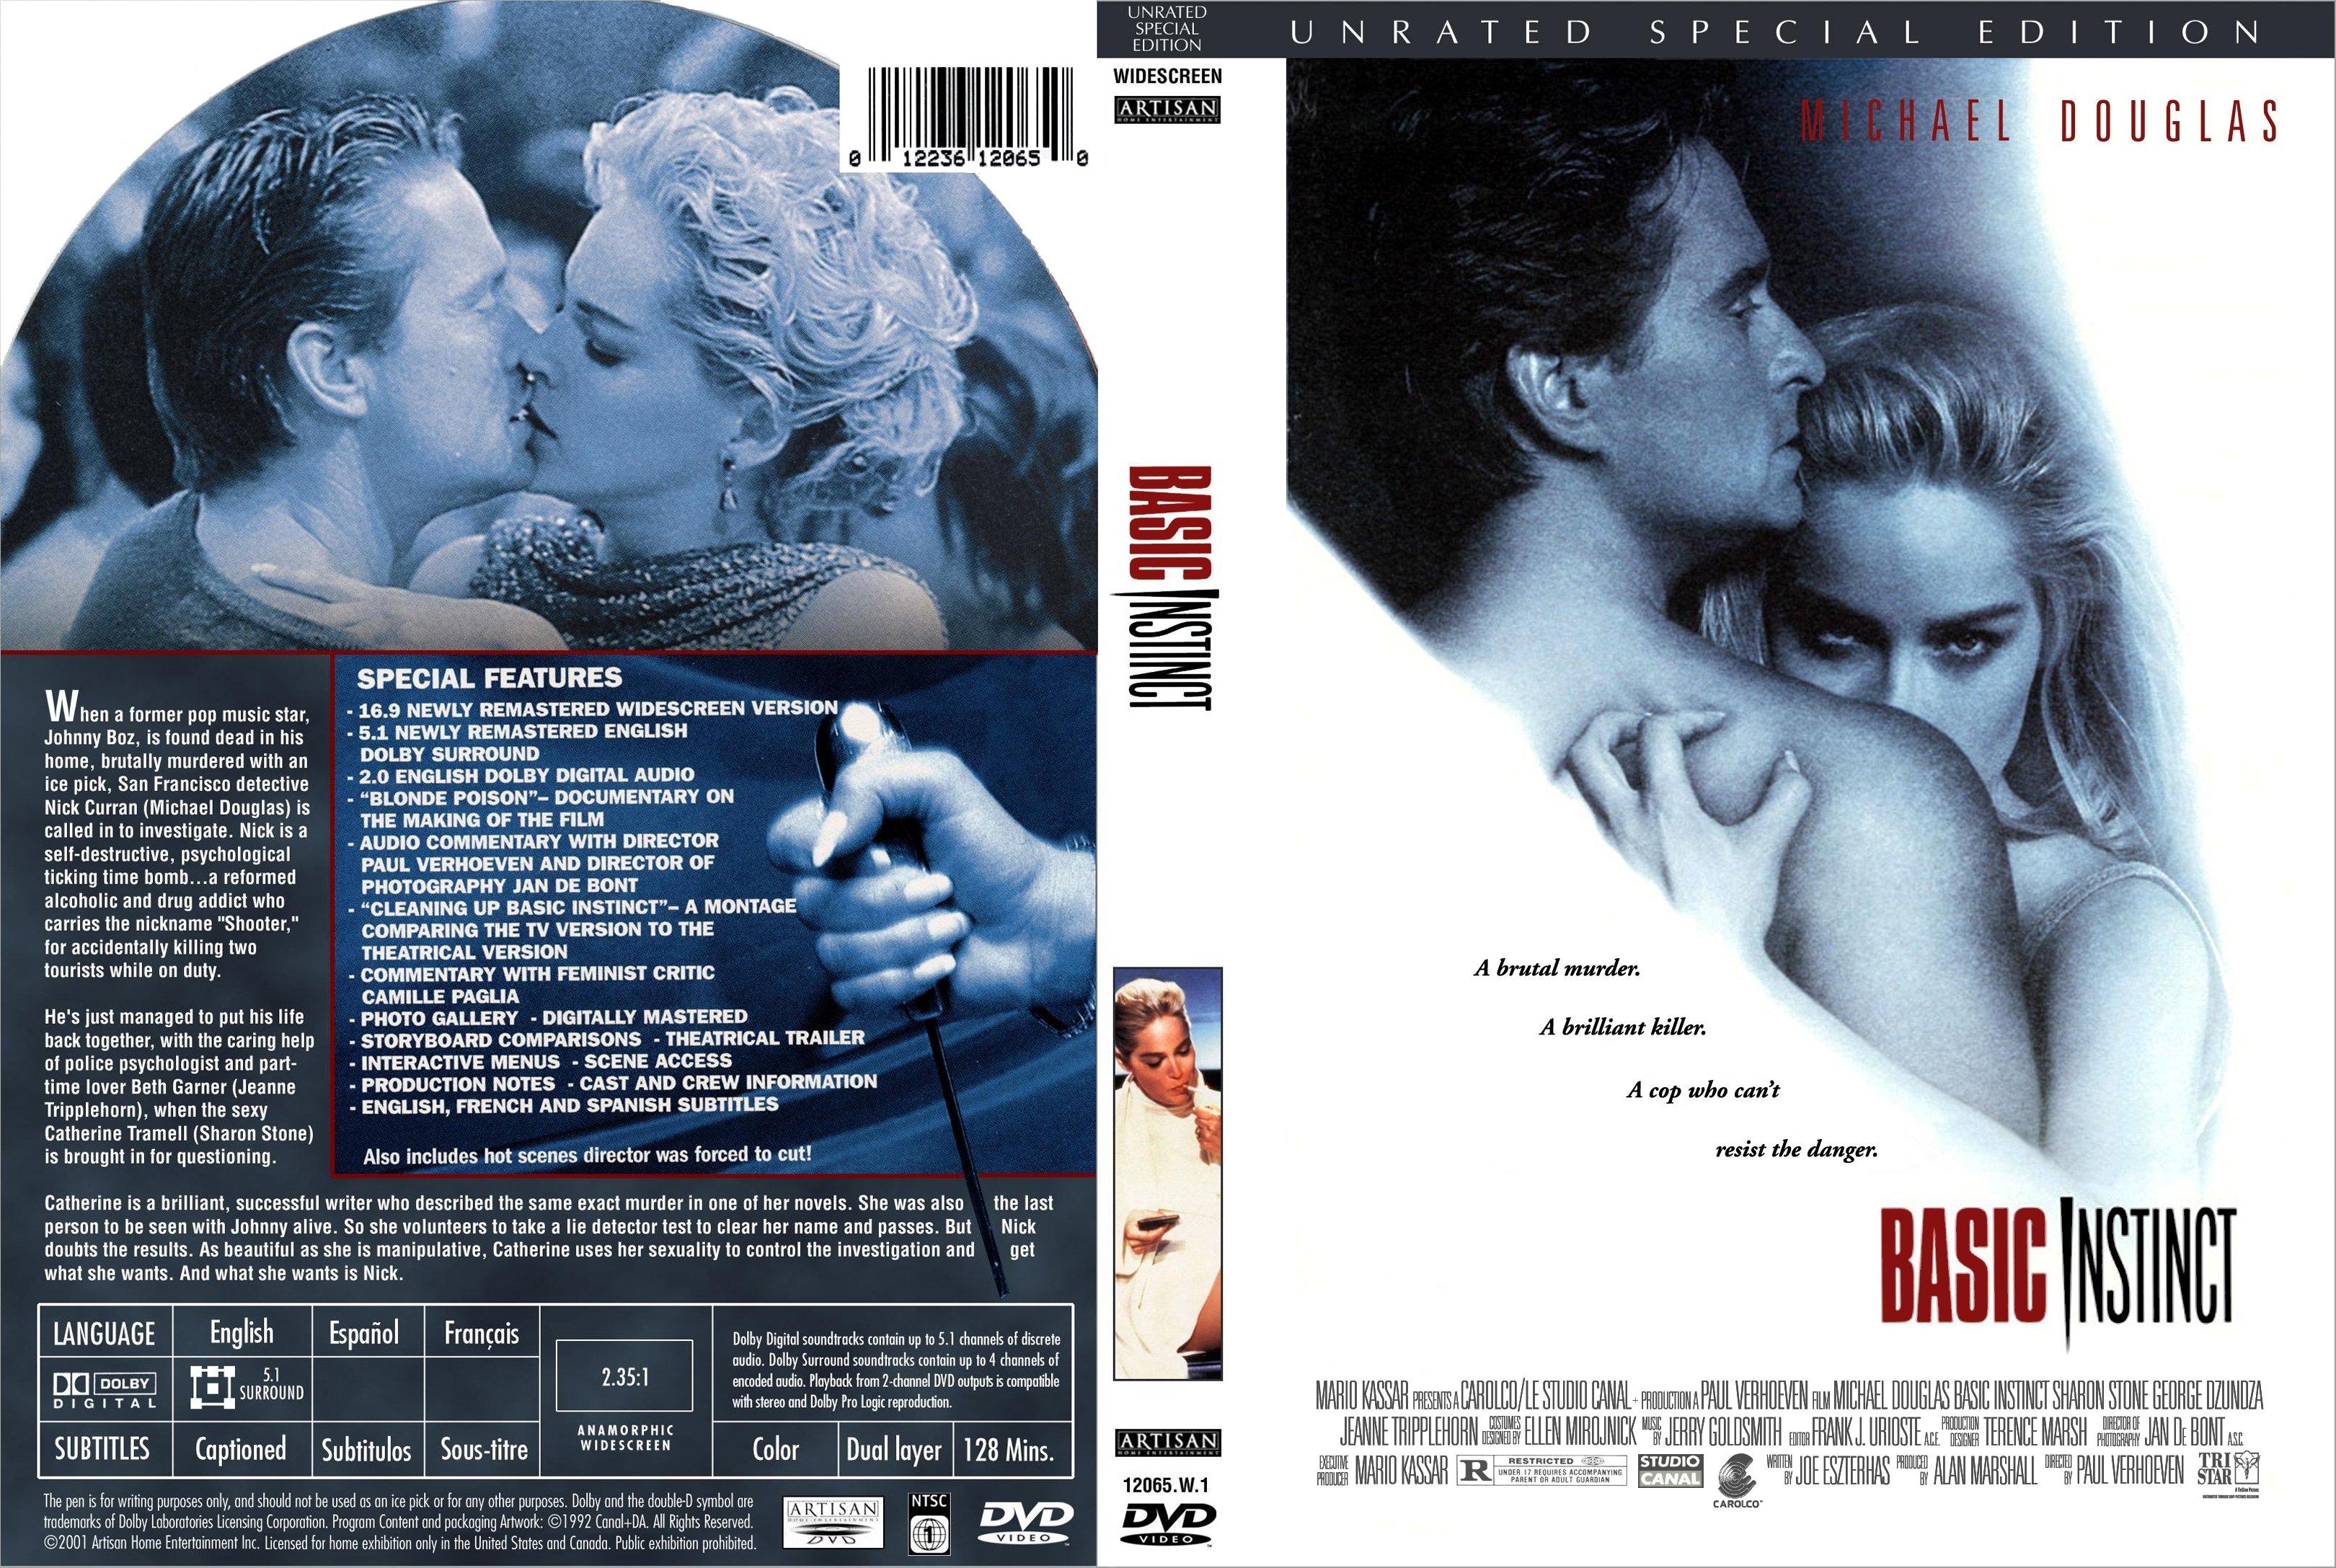 Covers Box Sk Basic Instinct 1992 High Quality Dvd Blueray Movie